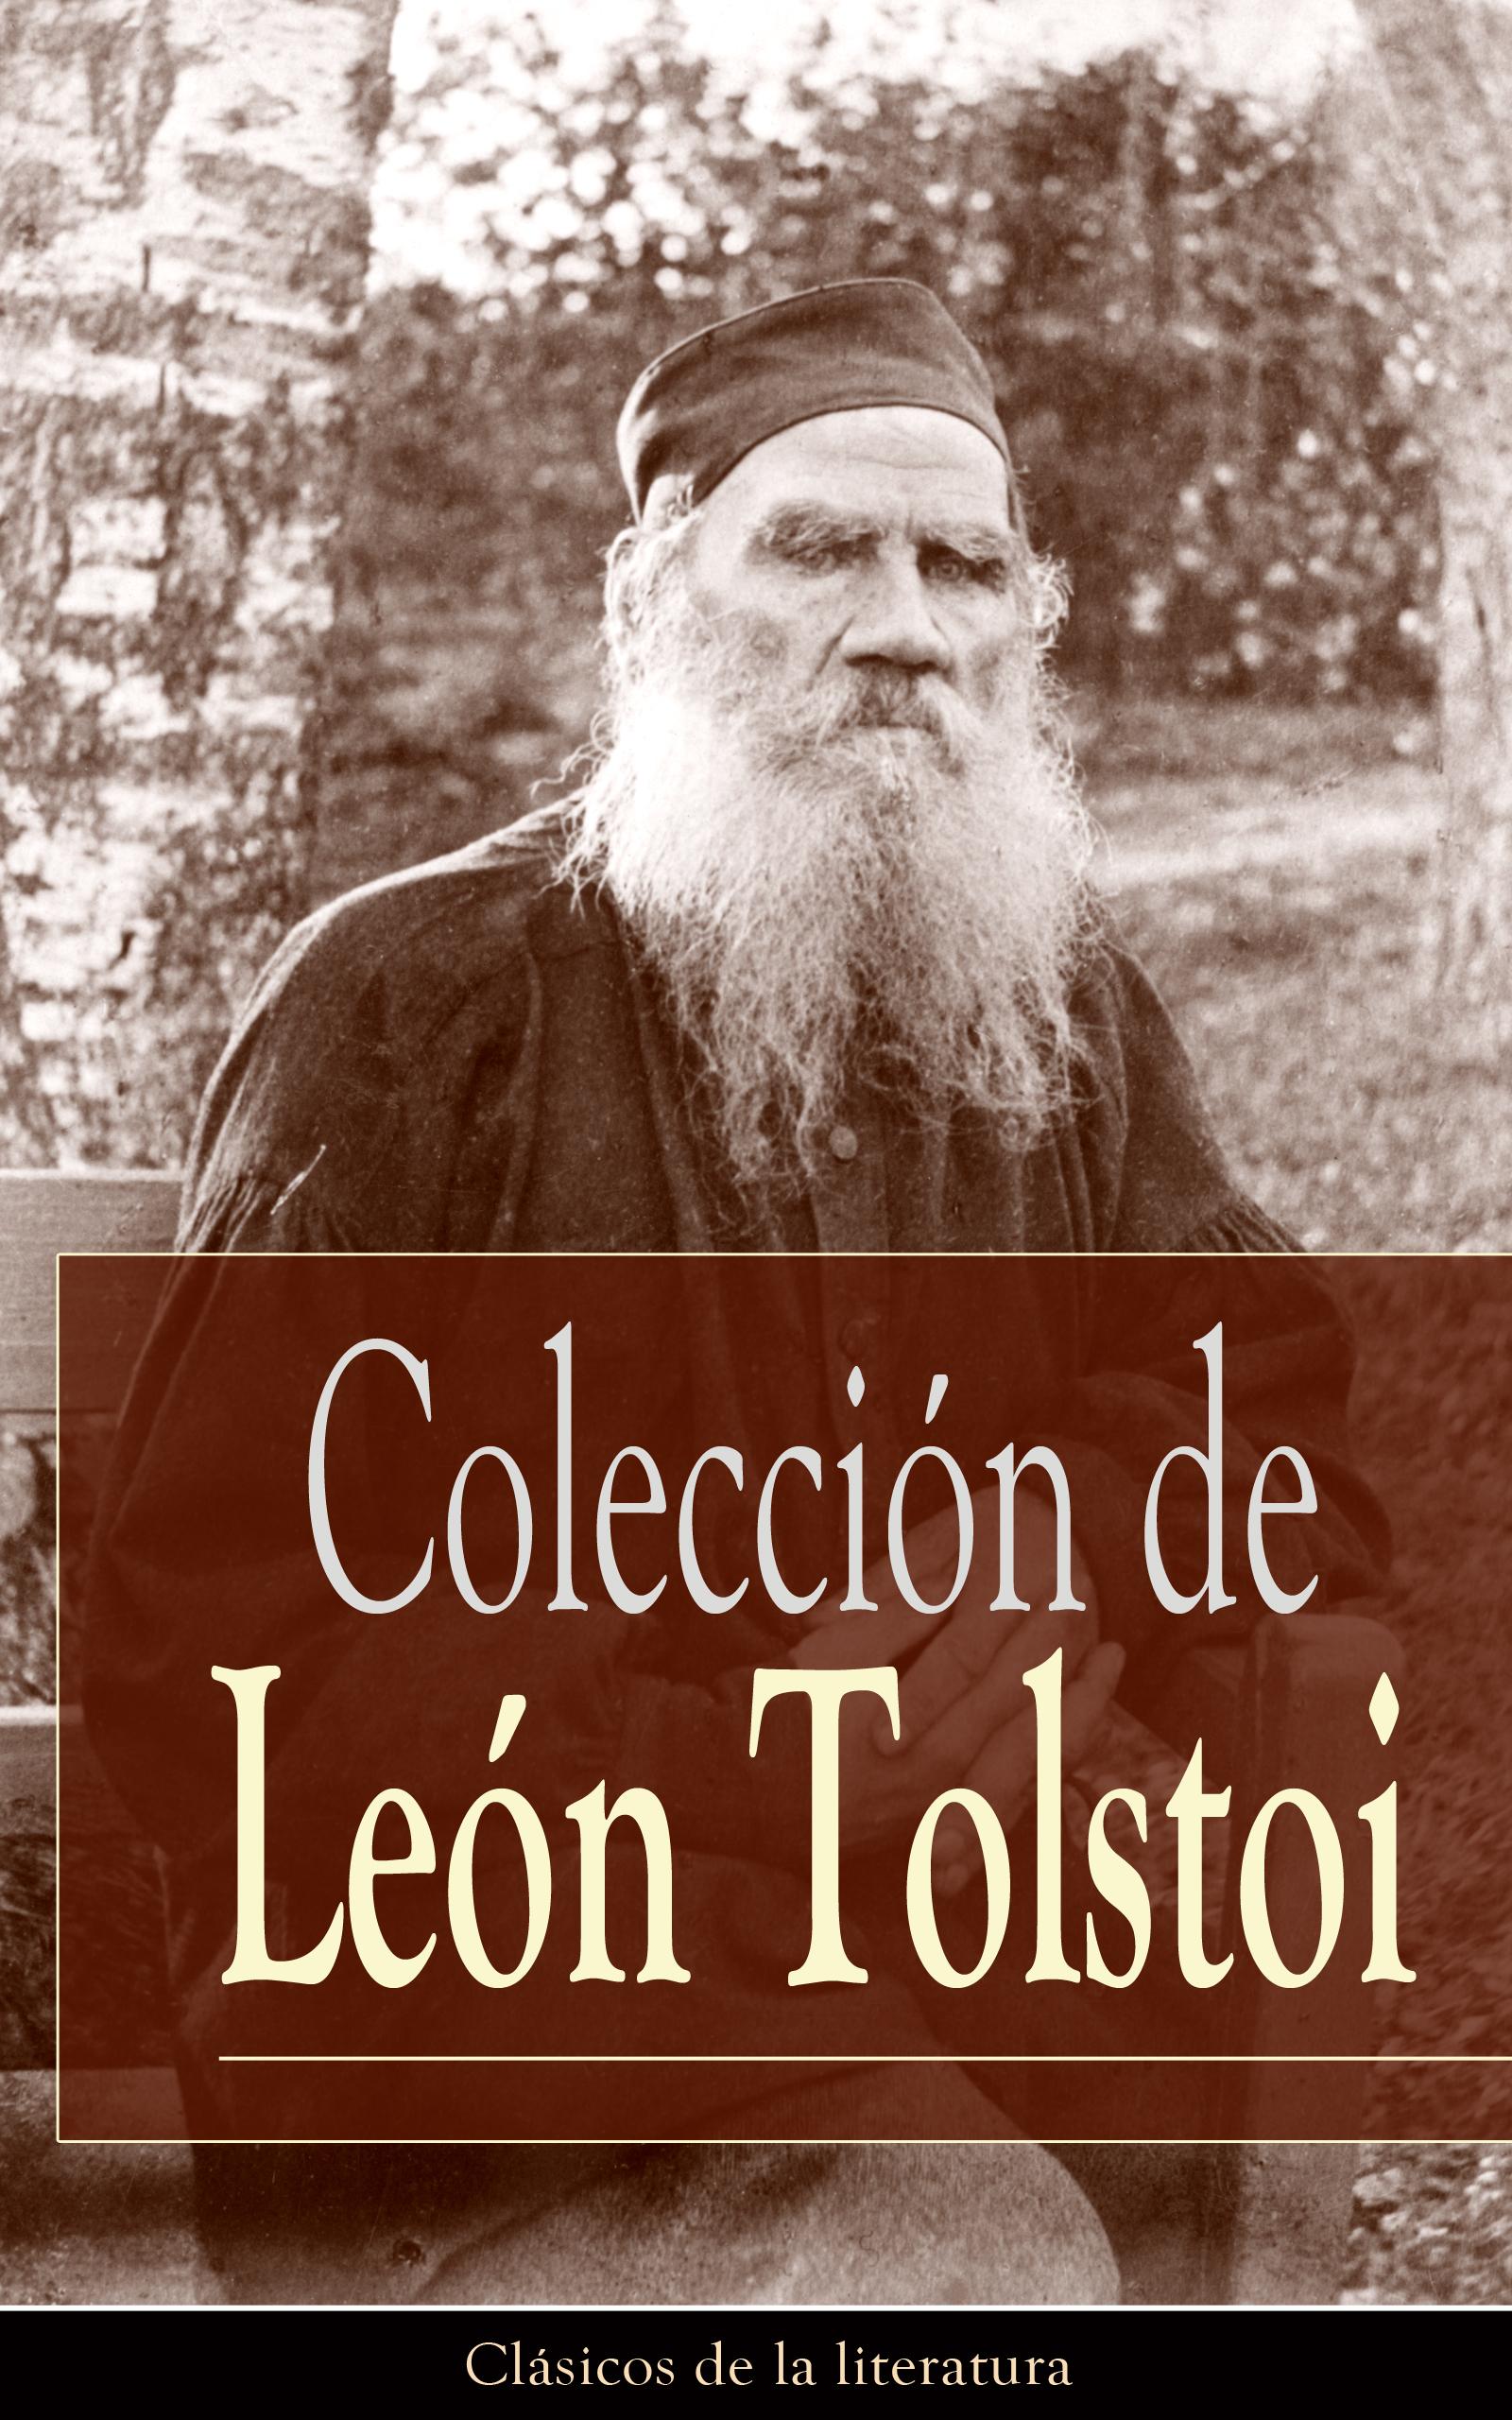 Leon Tolstoi Colección de León Tolstoi лев толстой tolstoi for the young select tales from tolstoi